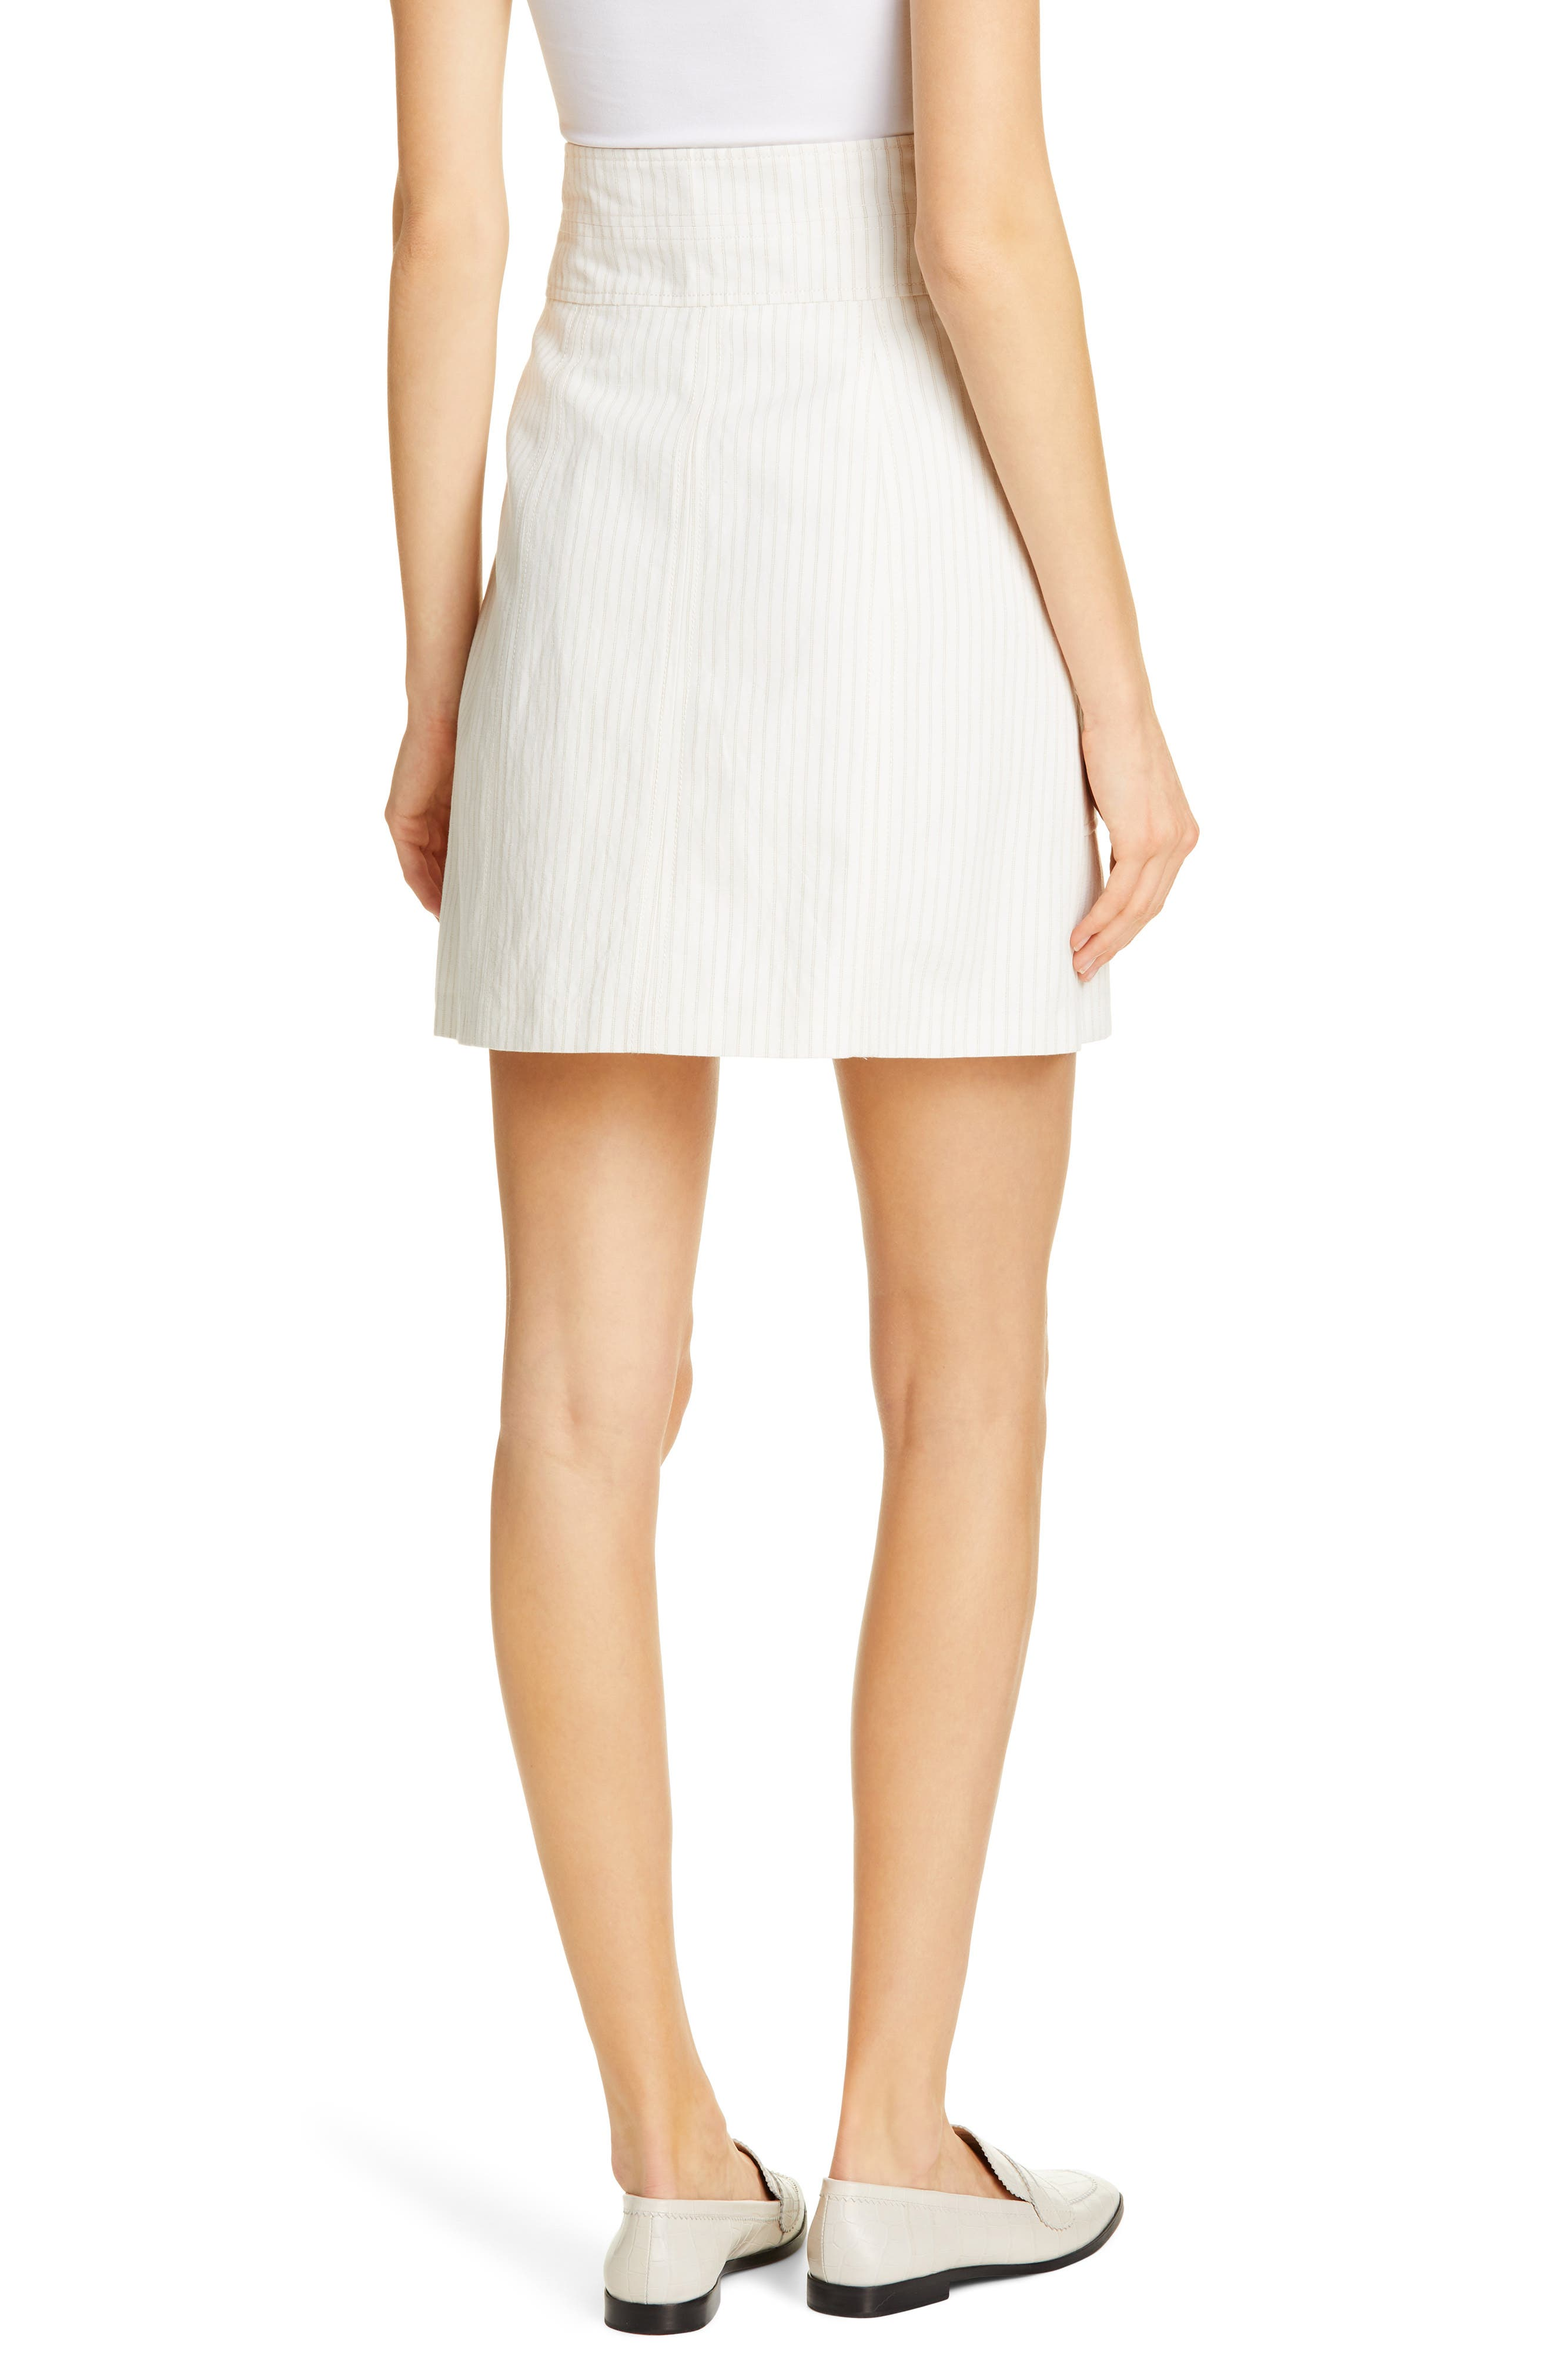 REBECCA TAYLOR, Zip Front Pinstripe Cotton & Linen Skirt, Alternate thumbnail 2, color, SNOW COMBO